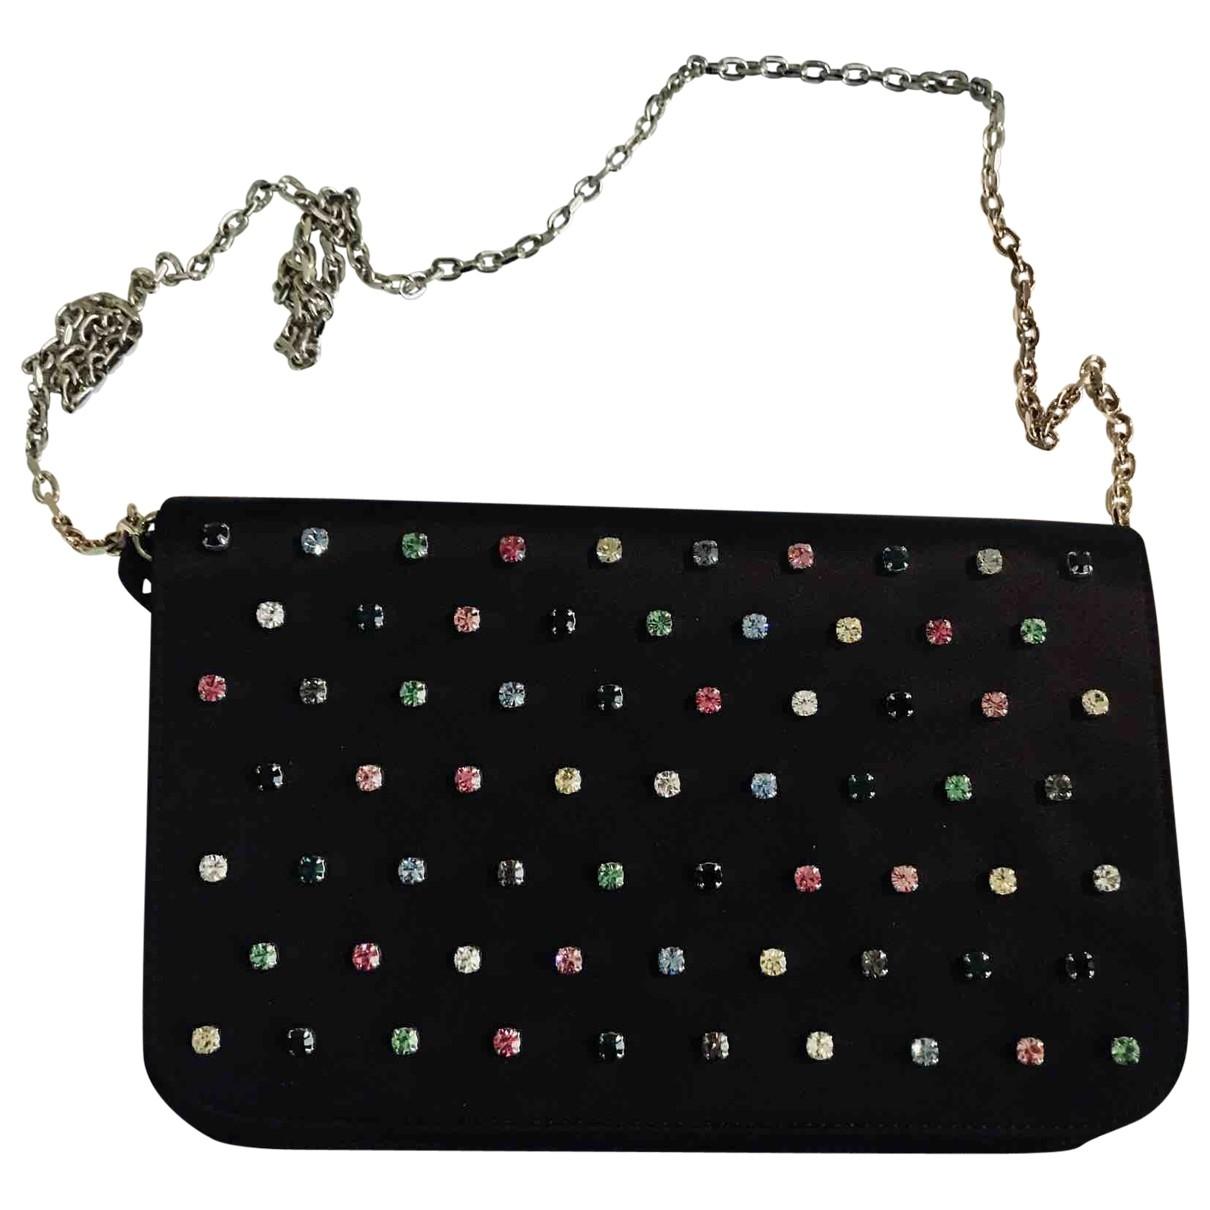 Red Valentino Garavani \N Black Silk handbag for Women \N